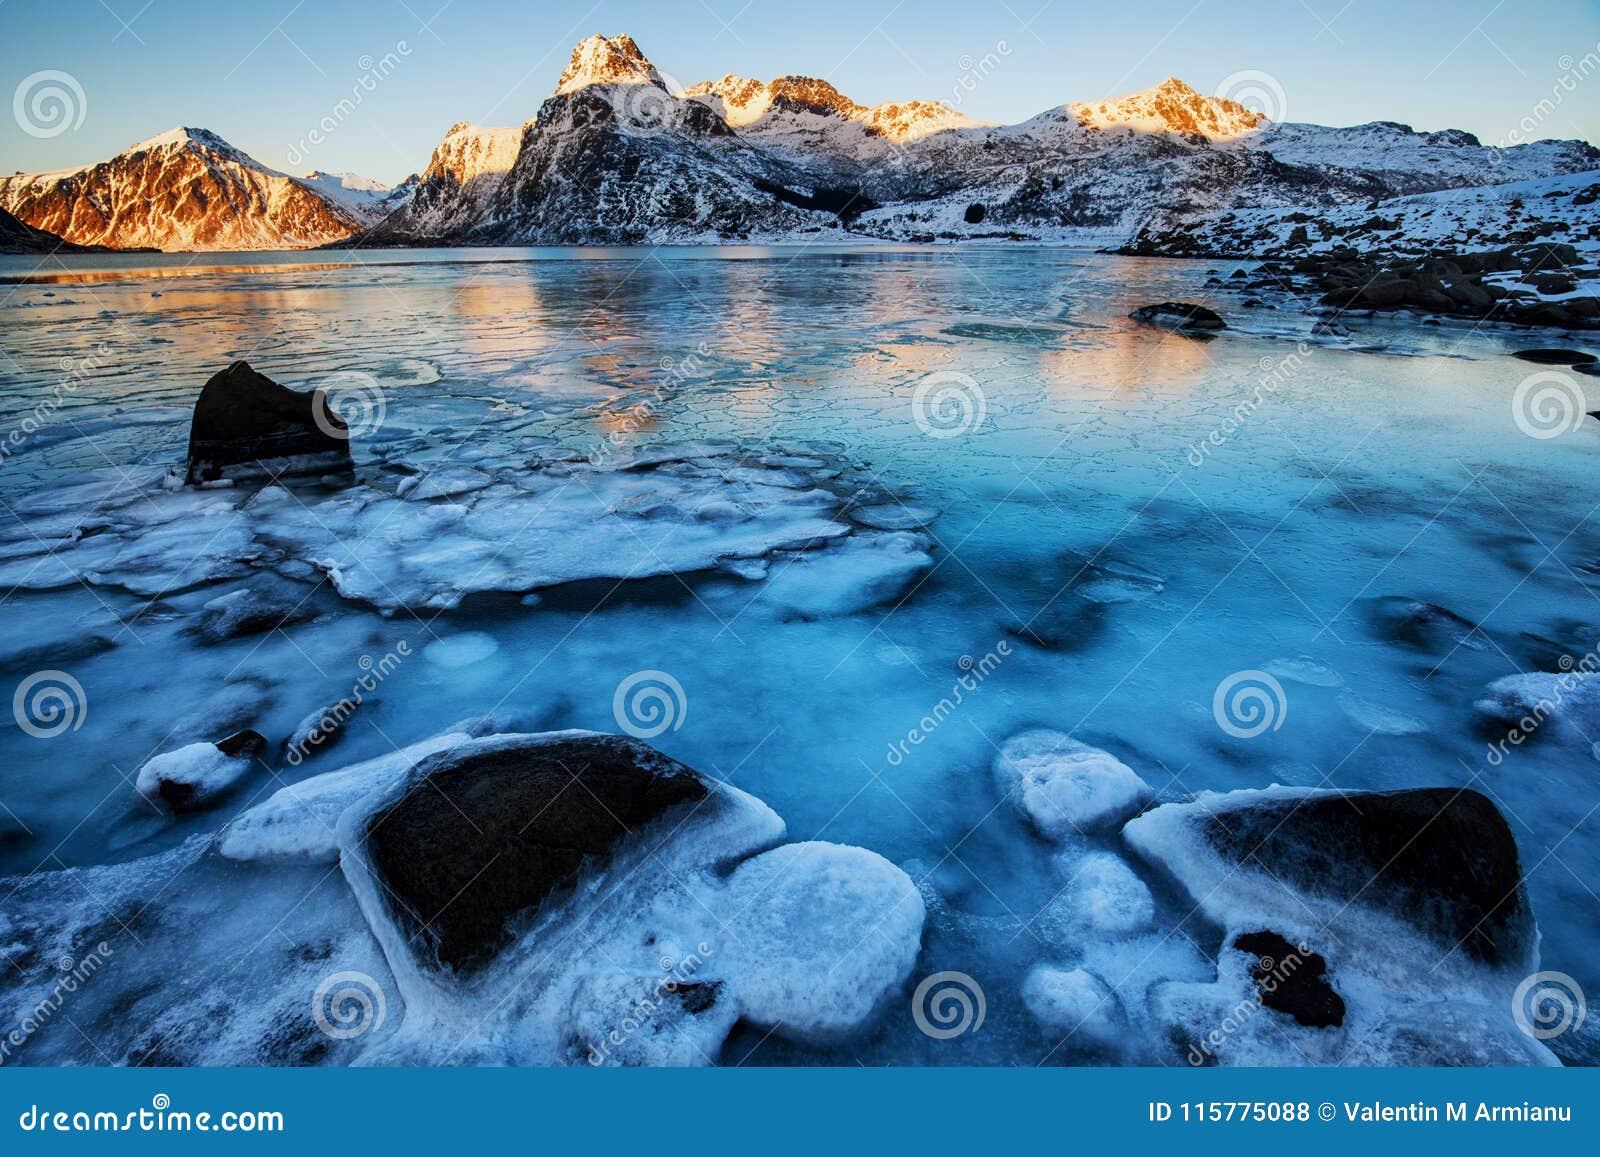 Frozen lake in the winter